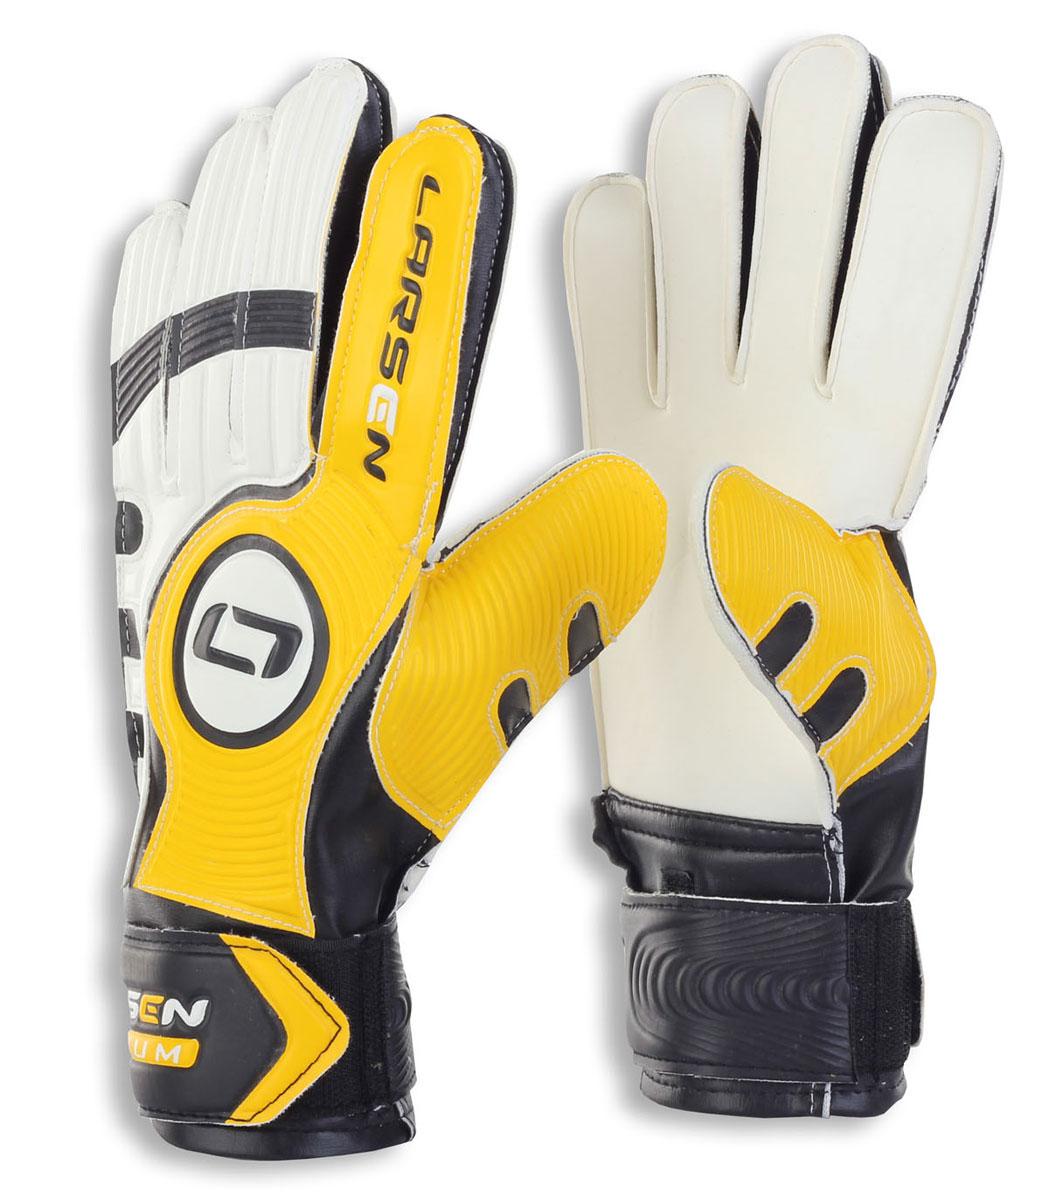 "Larsen Перчатки вратарские Larsen ""Radium"", цвет: черный, желтый. Размер 6"